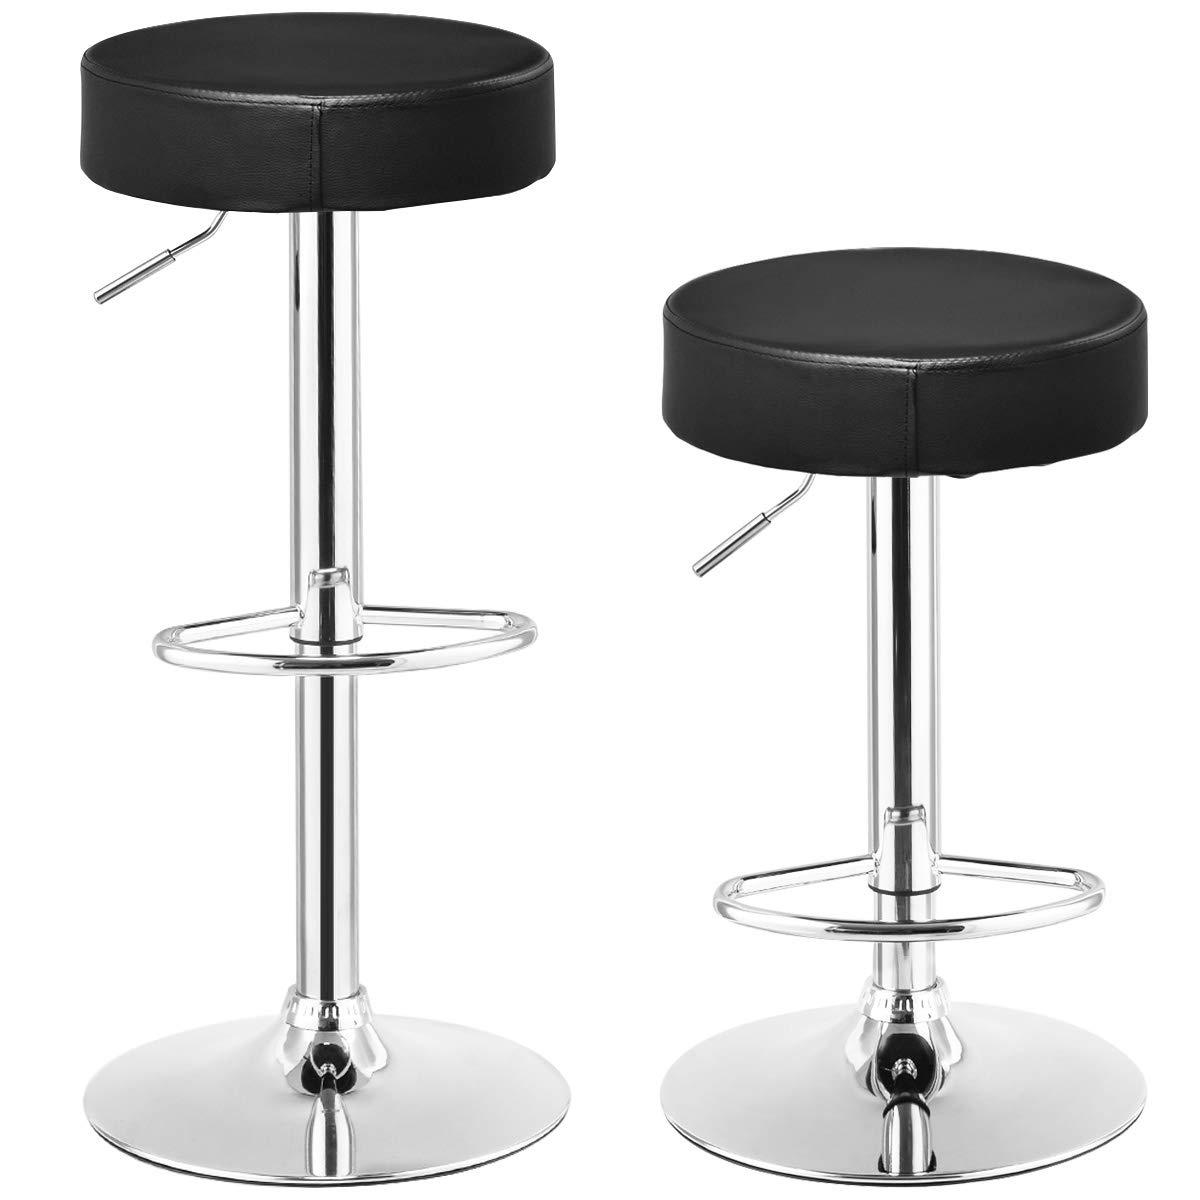 Set of 2  Adjustable Round Leather Seat Swivel Bar Stool